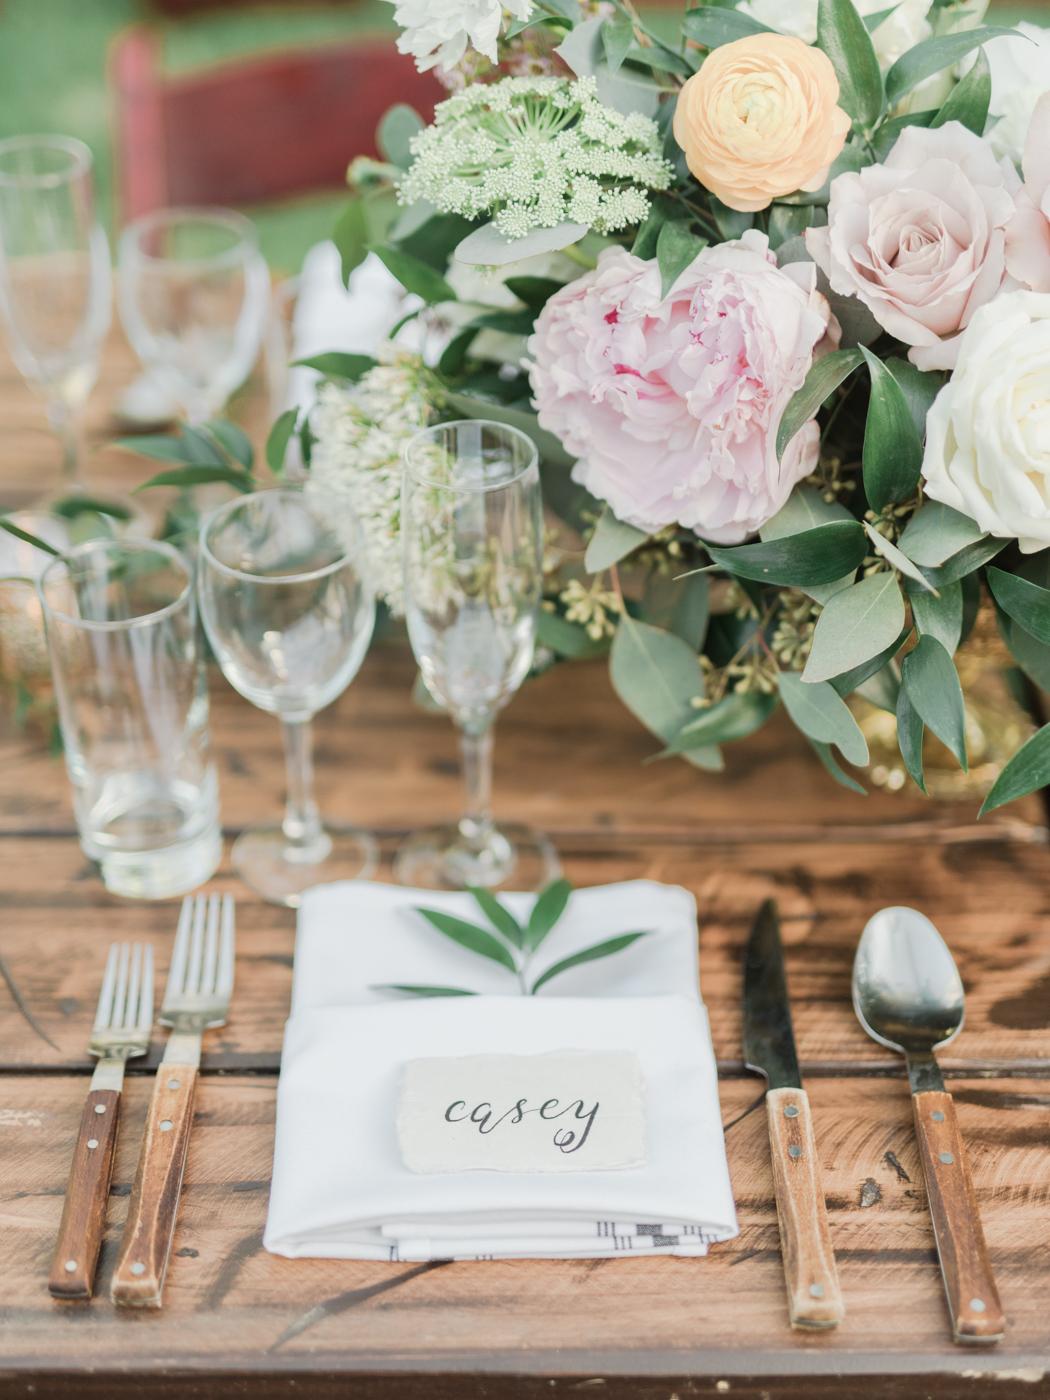 l&c-the_1909_spring_garden_wedding_los_angeles_fine_art_wedding_photographer-31.jpg